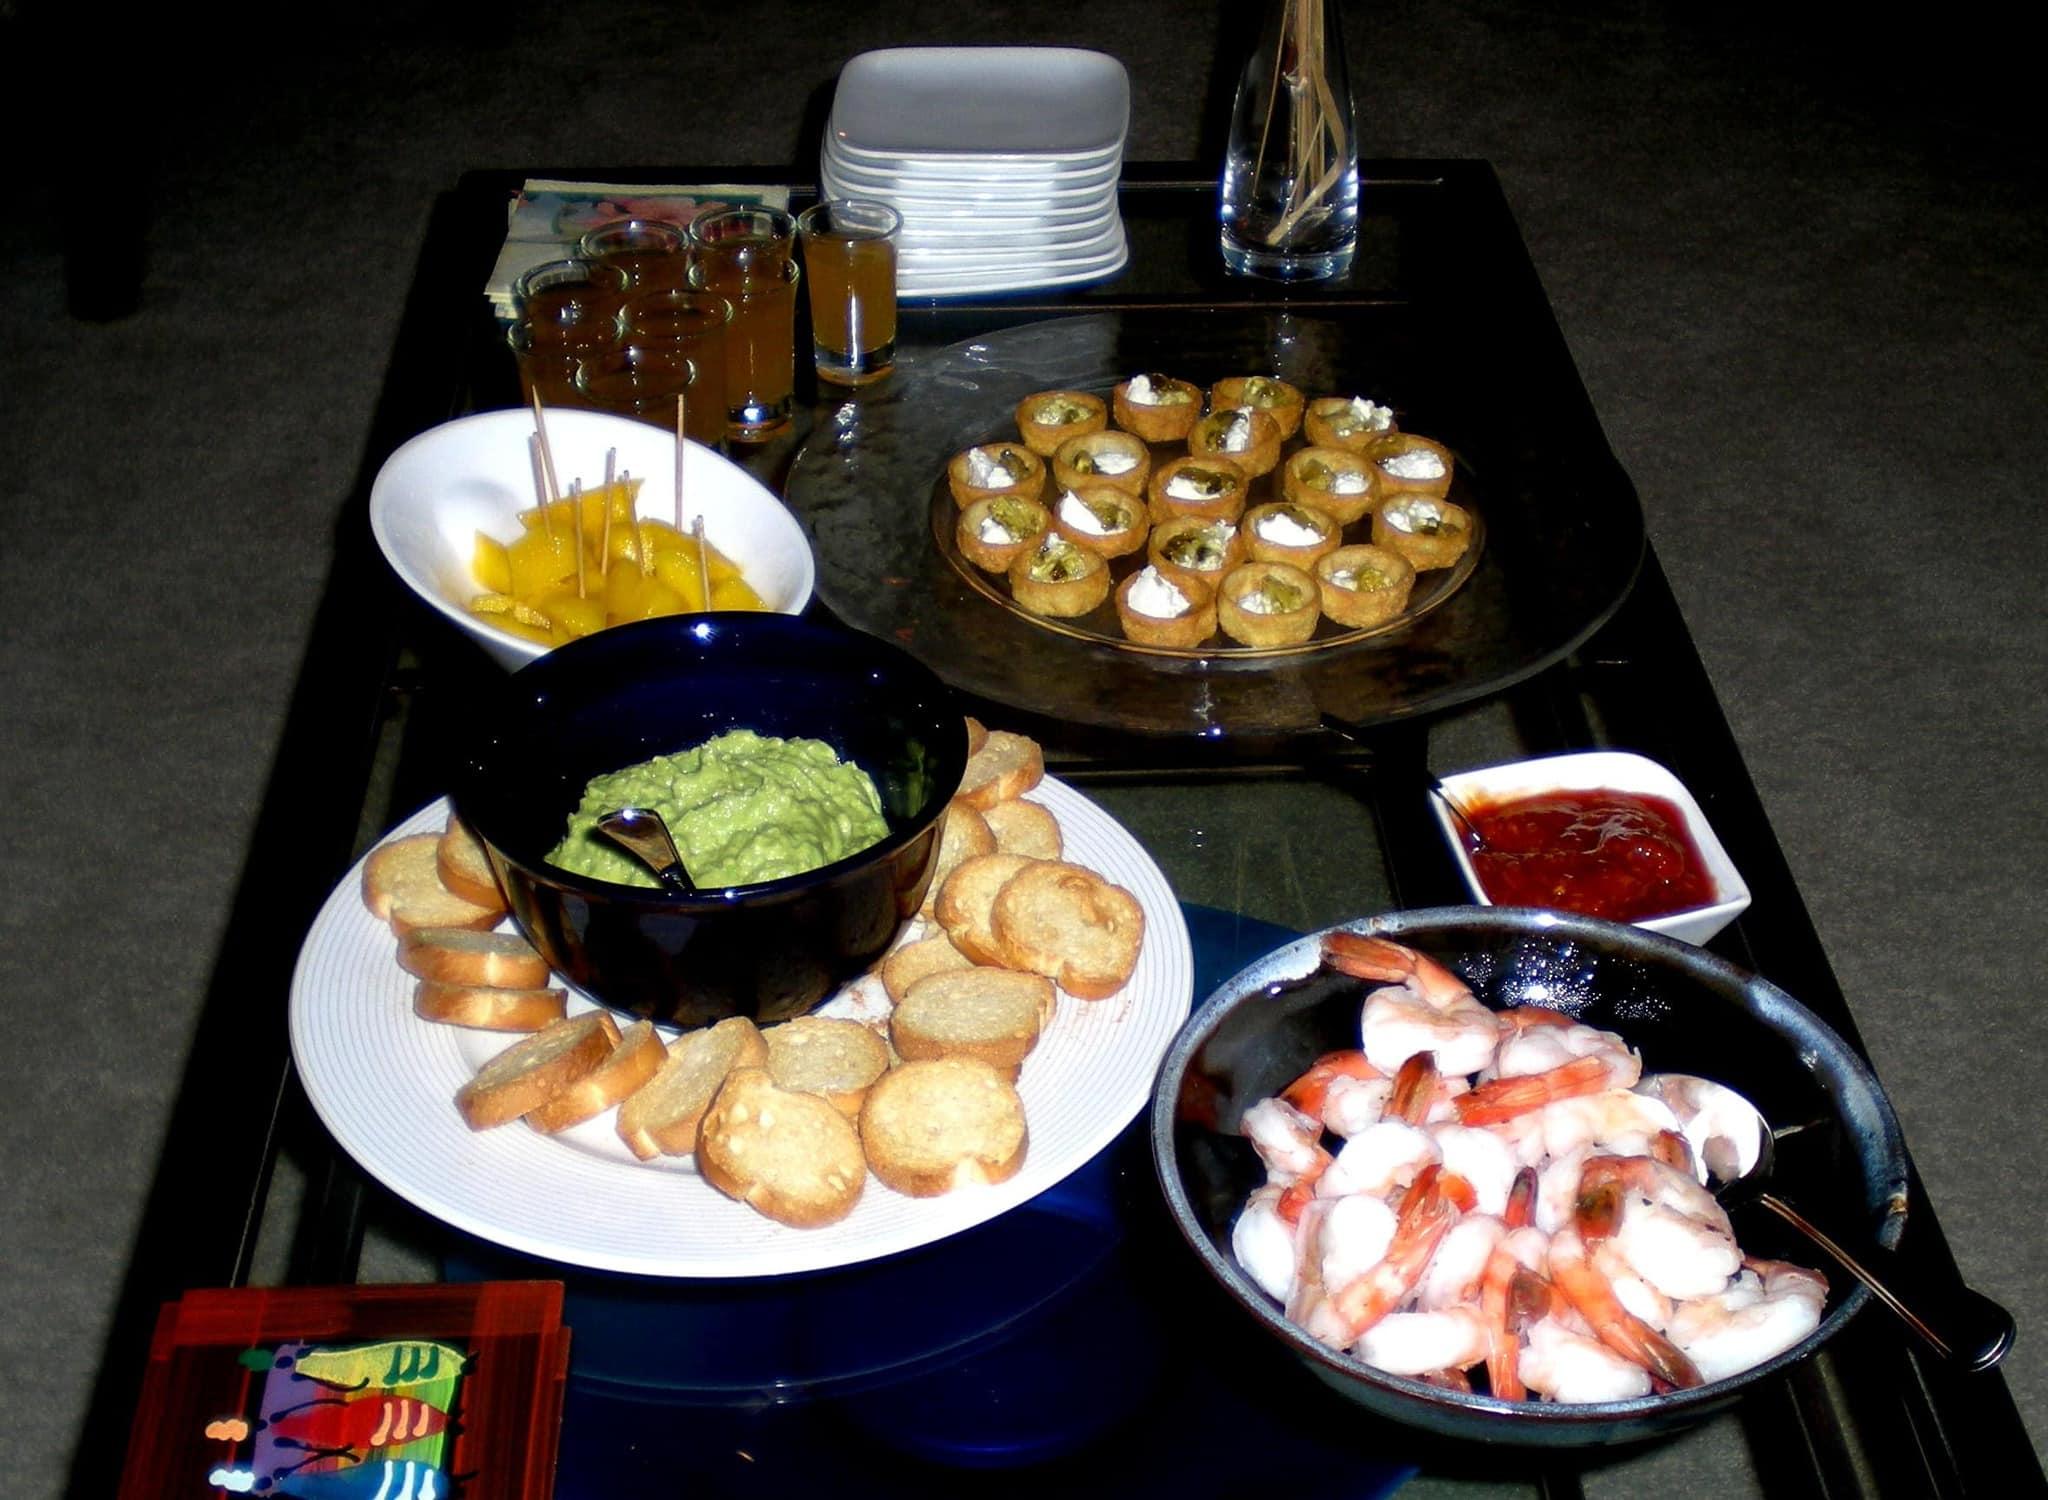 apple cider shots, fresh mango, guacamole, shrimp cocktail, mini